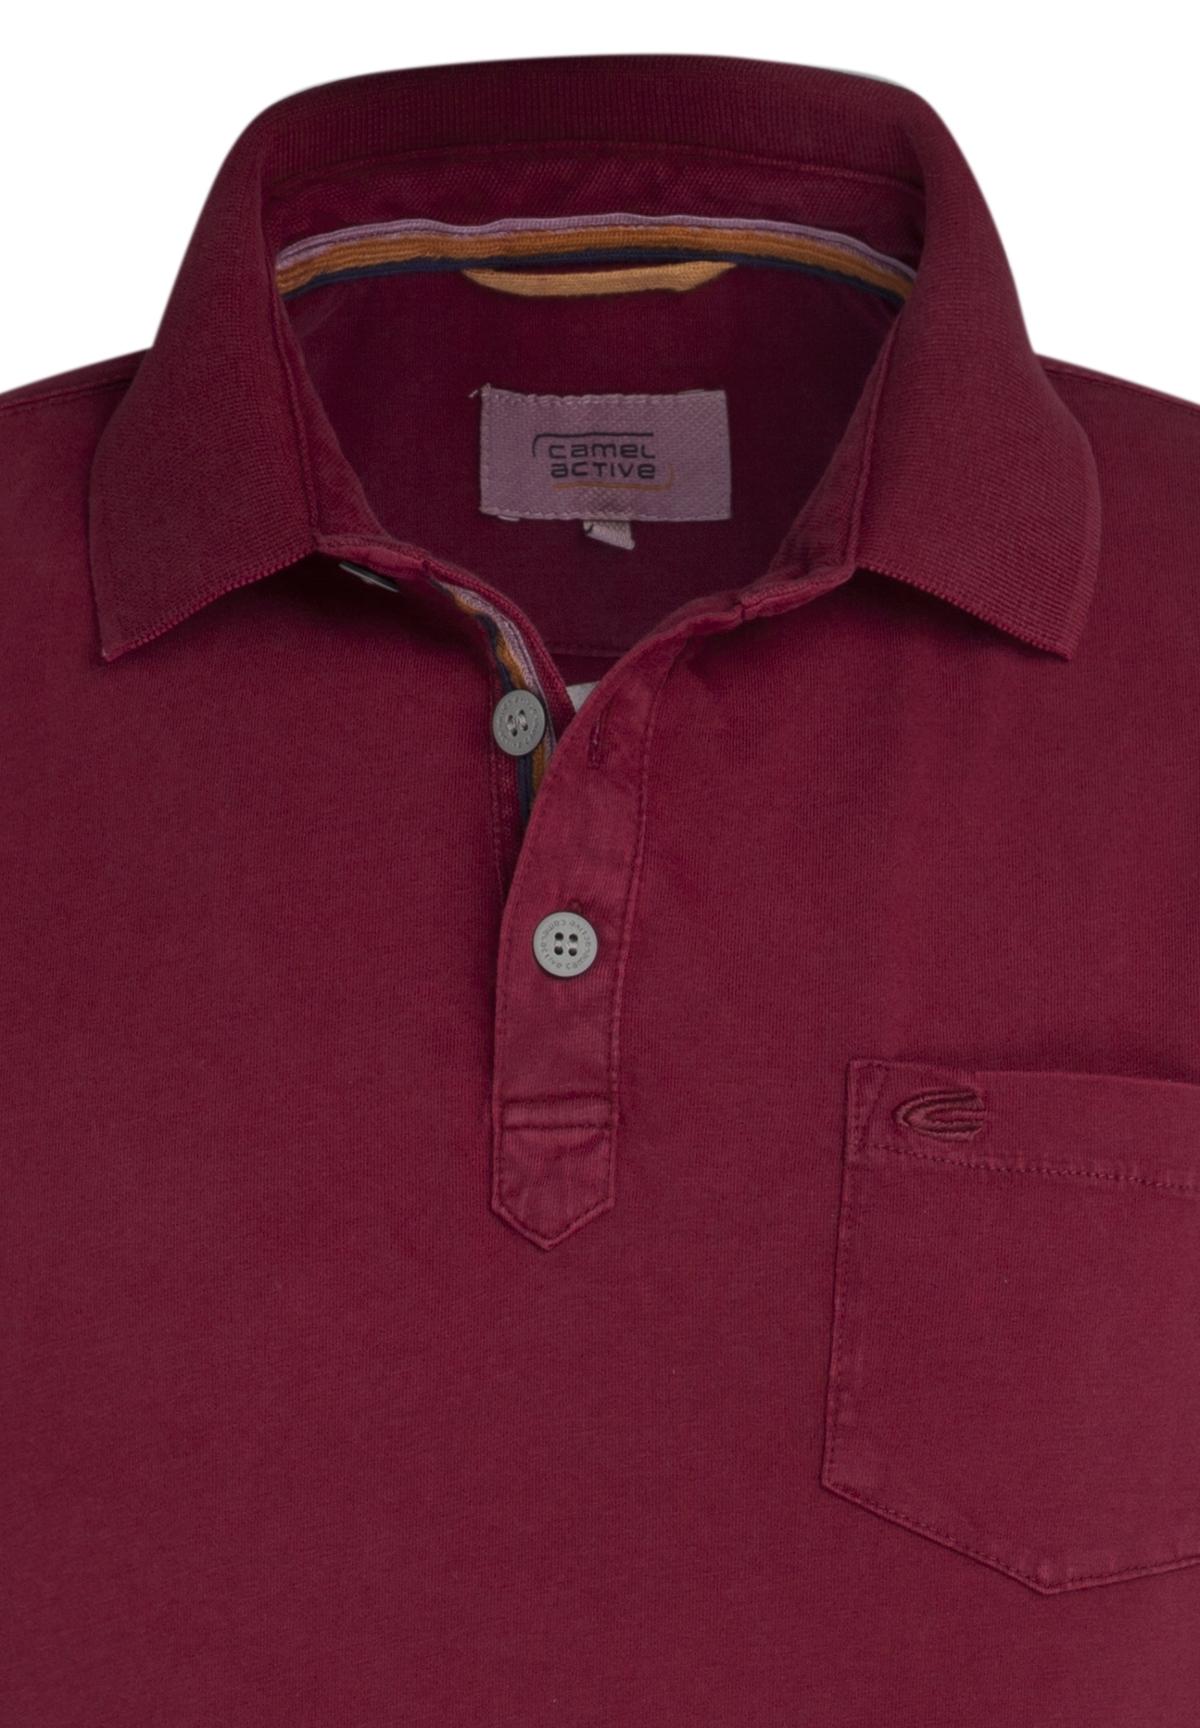 Camel-Active-Herren-Shirt-Poloshirt-Pique-Regular-Fit-NEU Indexbild 60